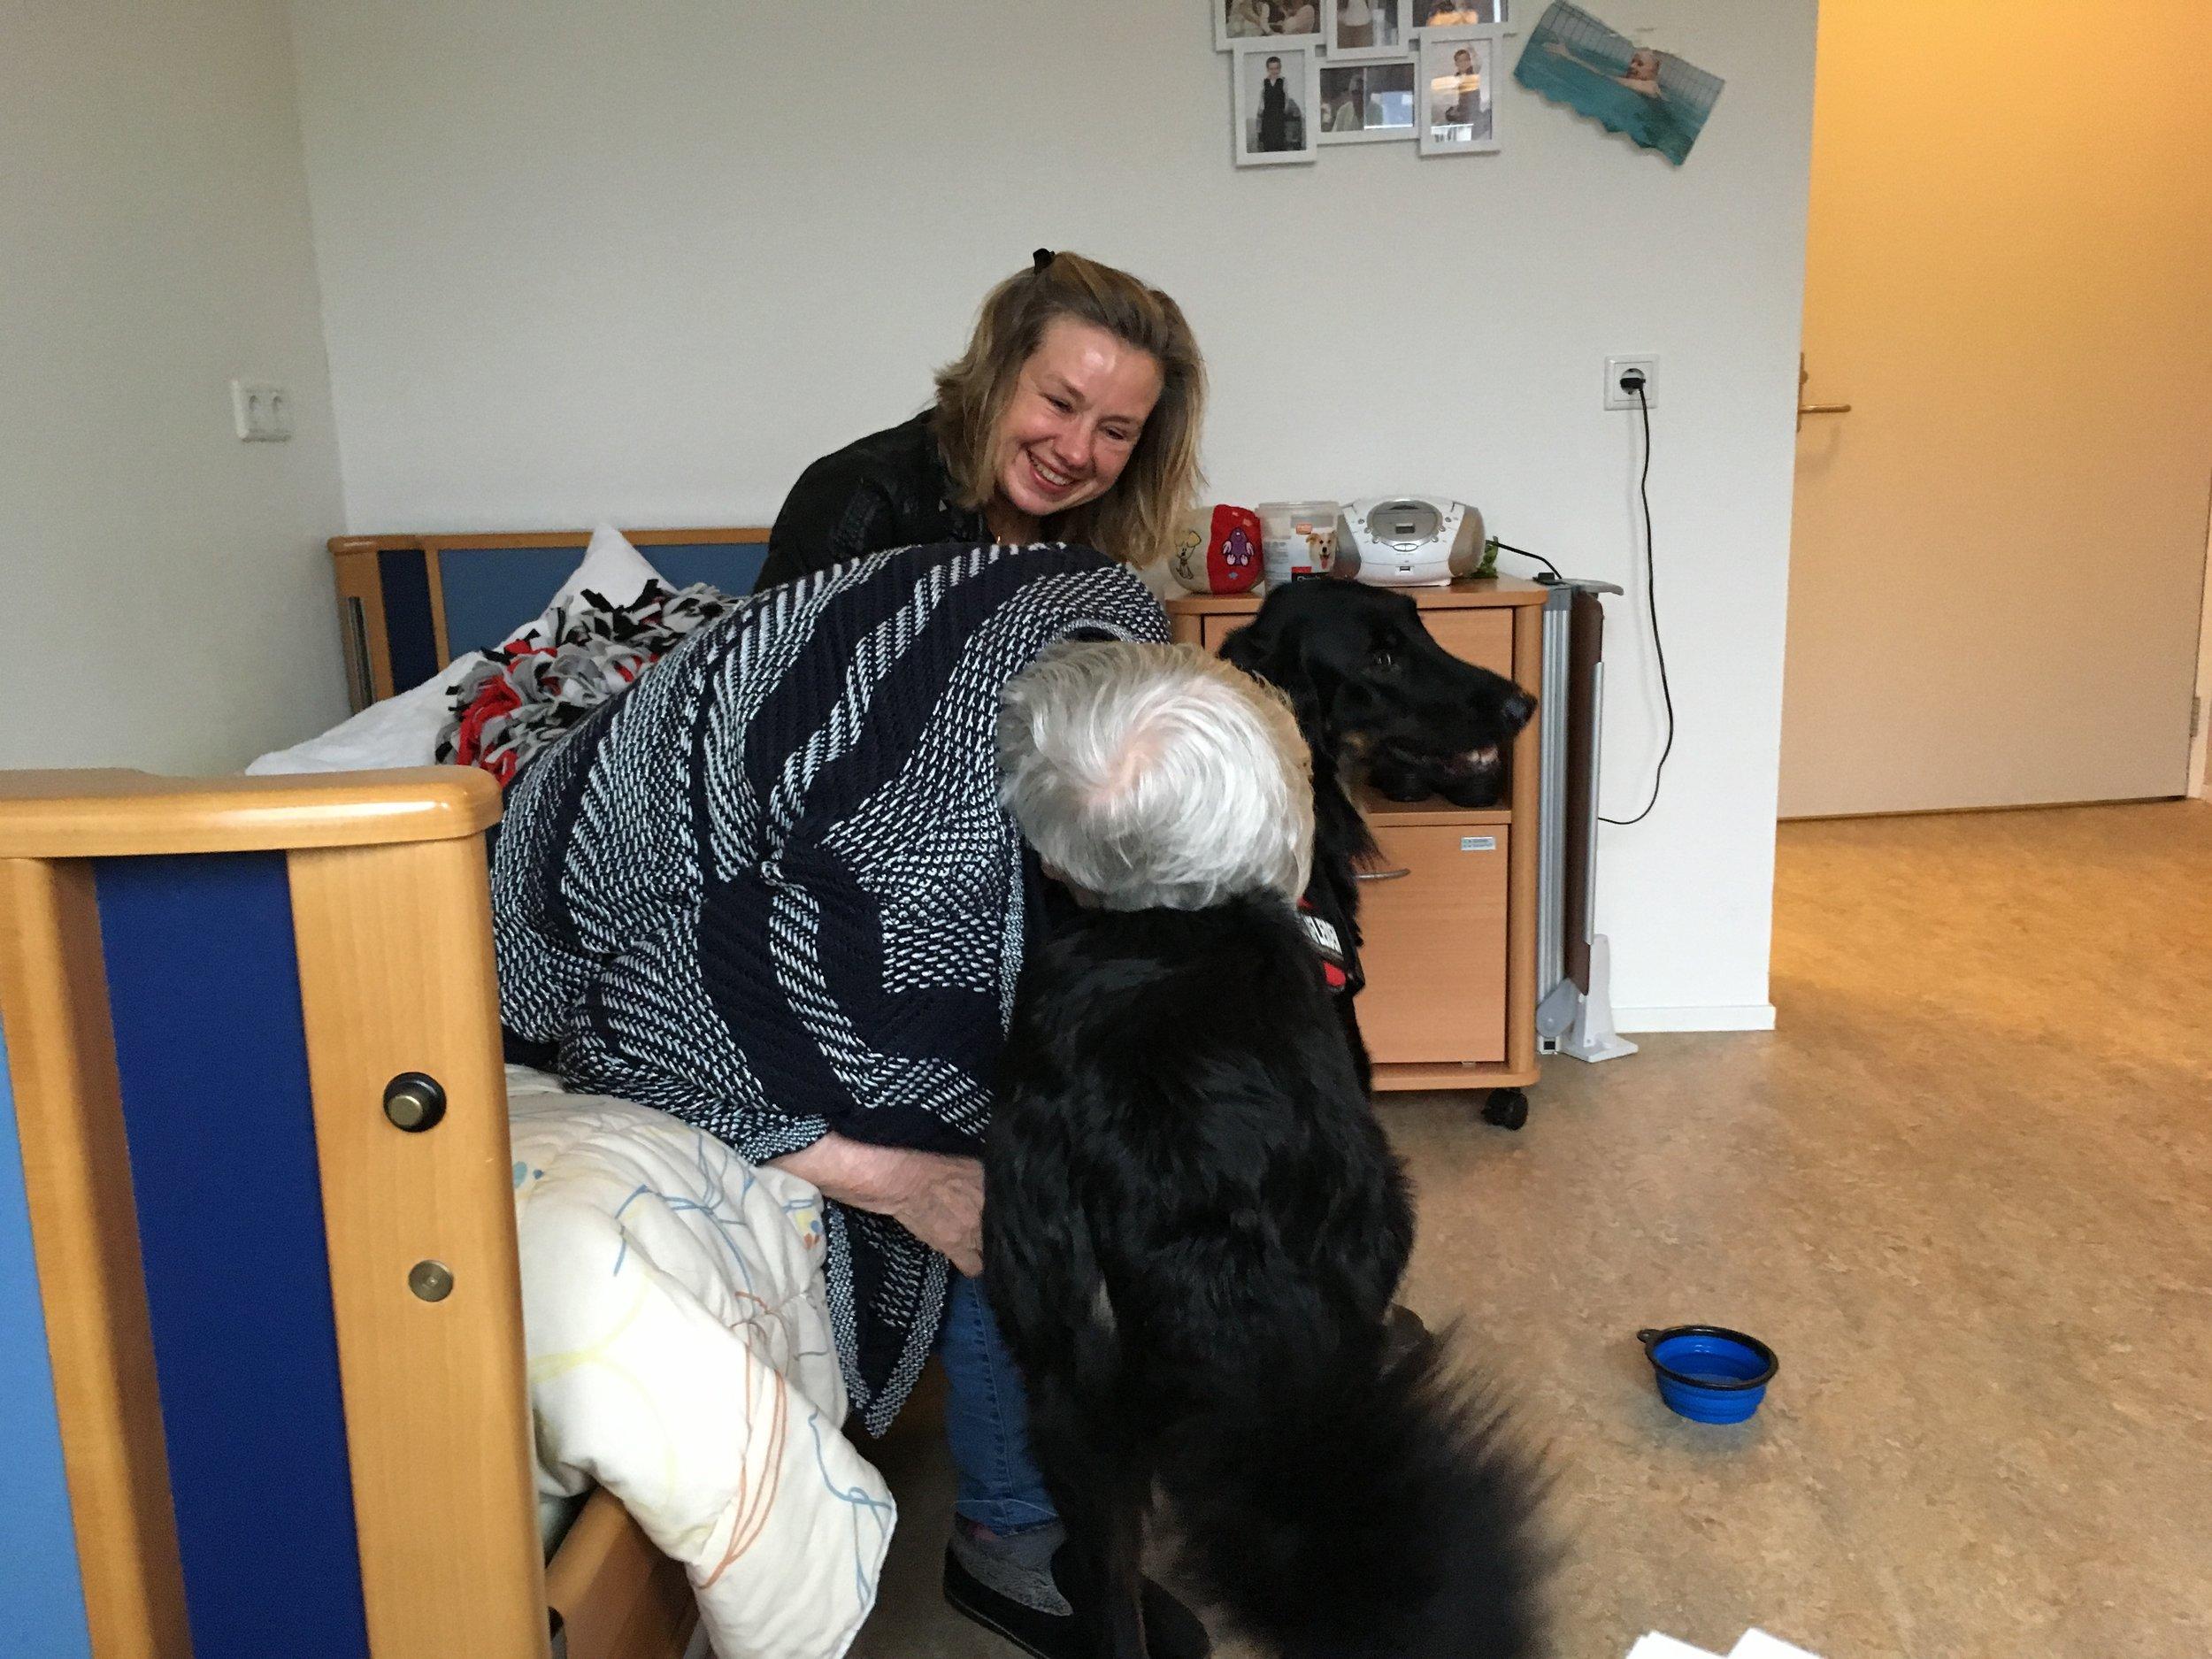 Lotje, Hovawart teef, therapiehond bij Letty Dreesman